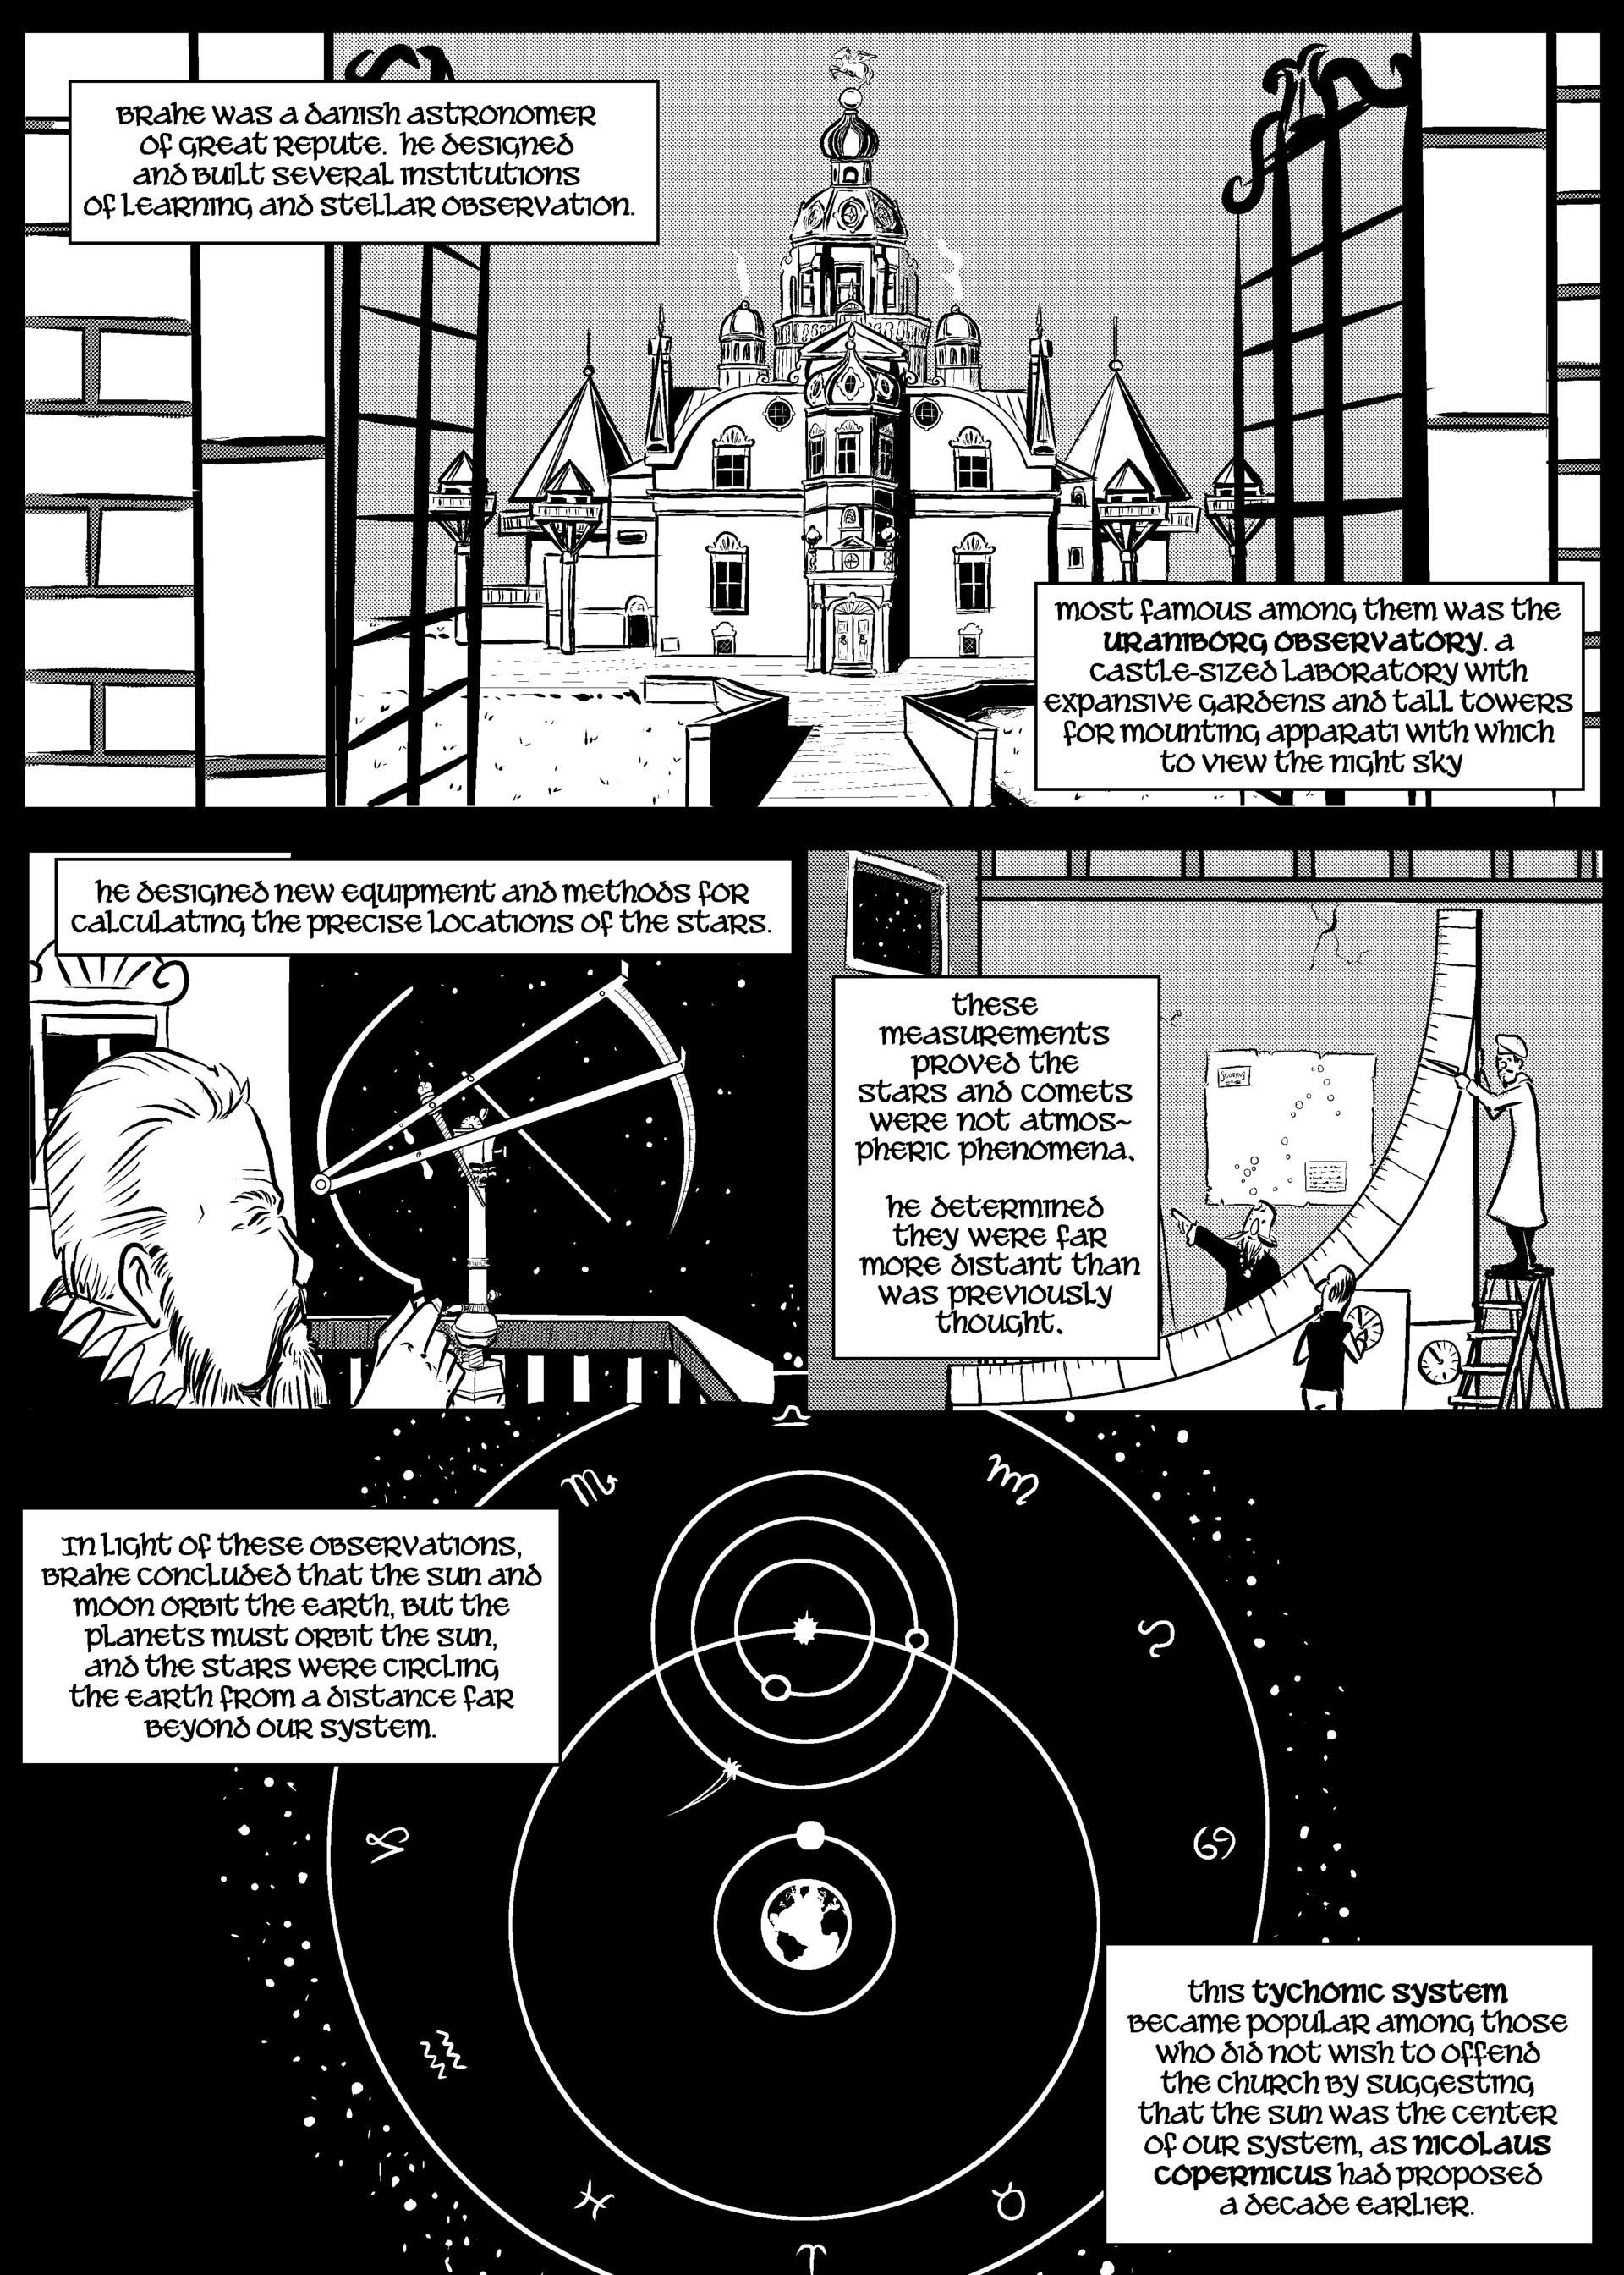 Michael davis heroes of the scientific revolution 002